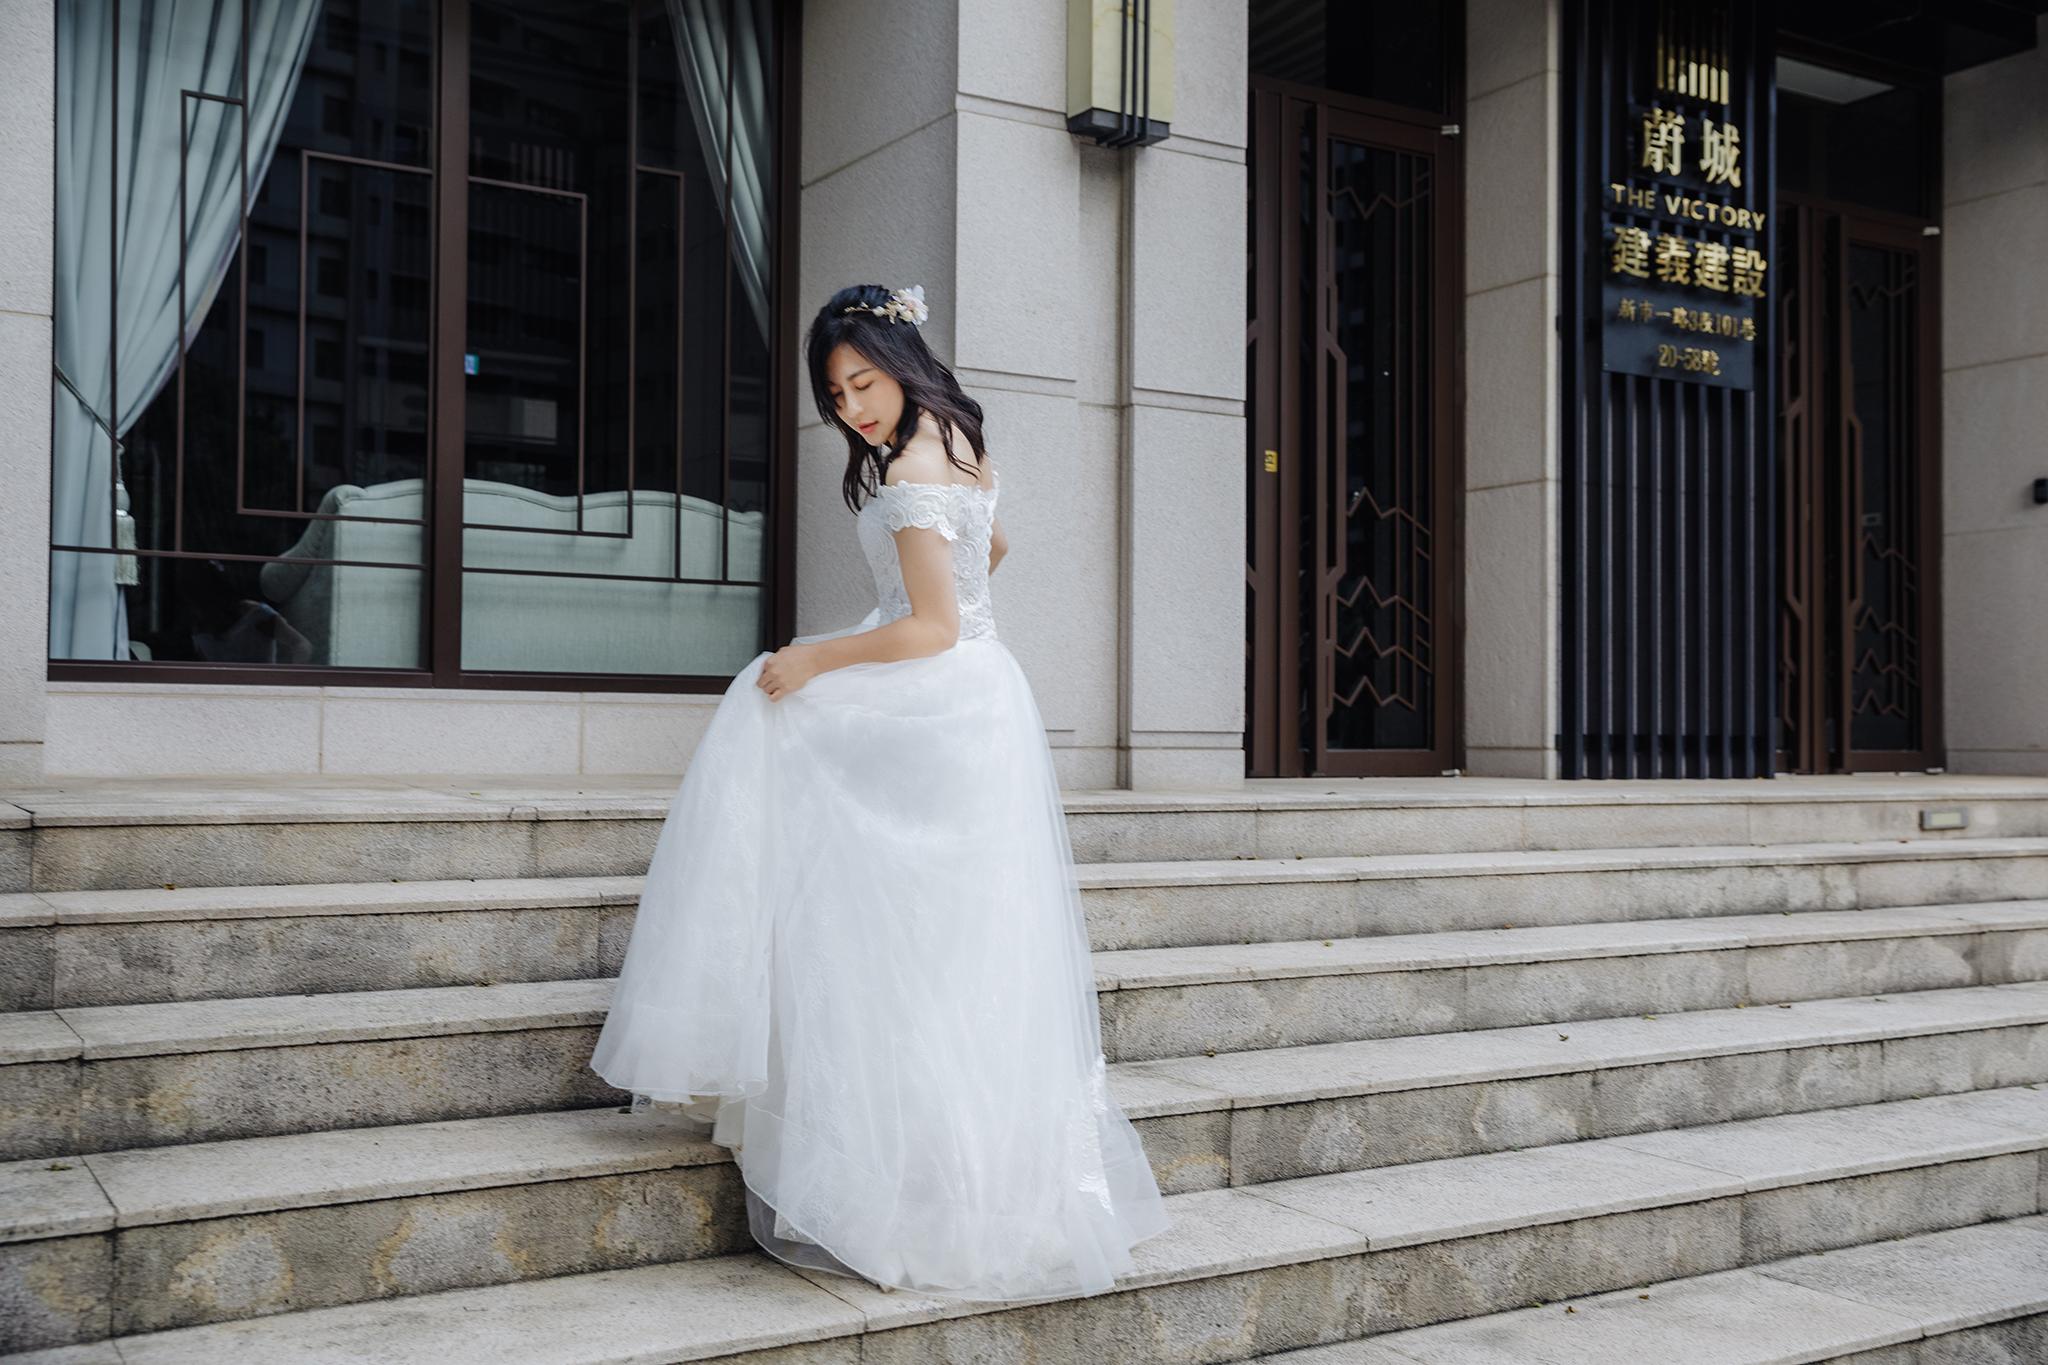 40901349543 b21dd37709 o - 【閨蜜婚紗】+育誠&娟羽&映煦+